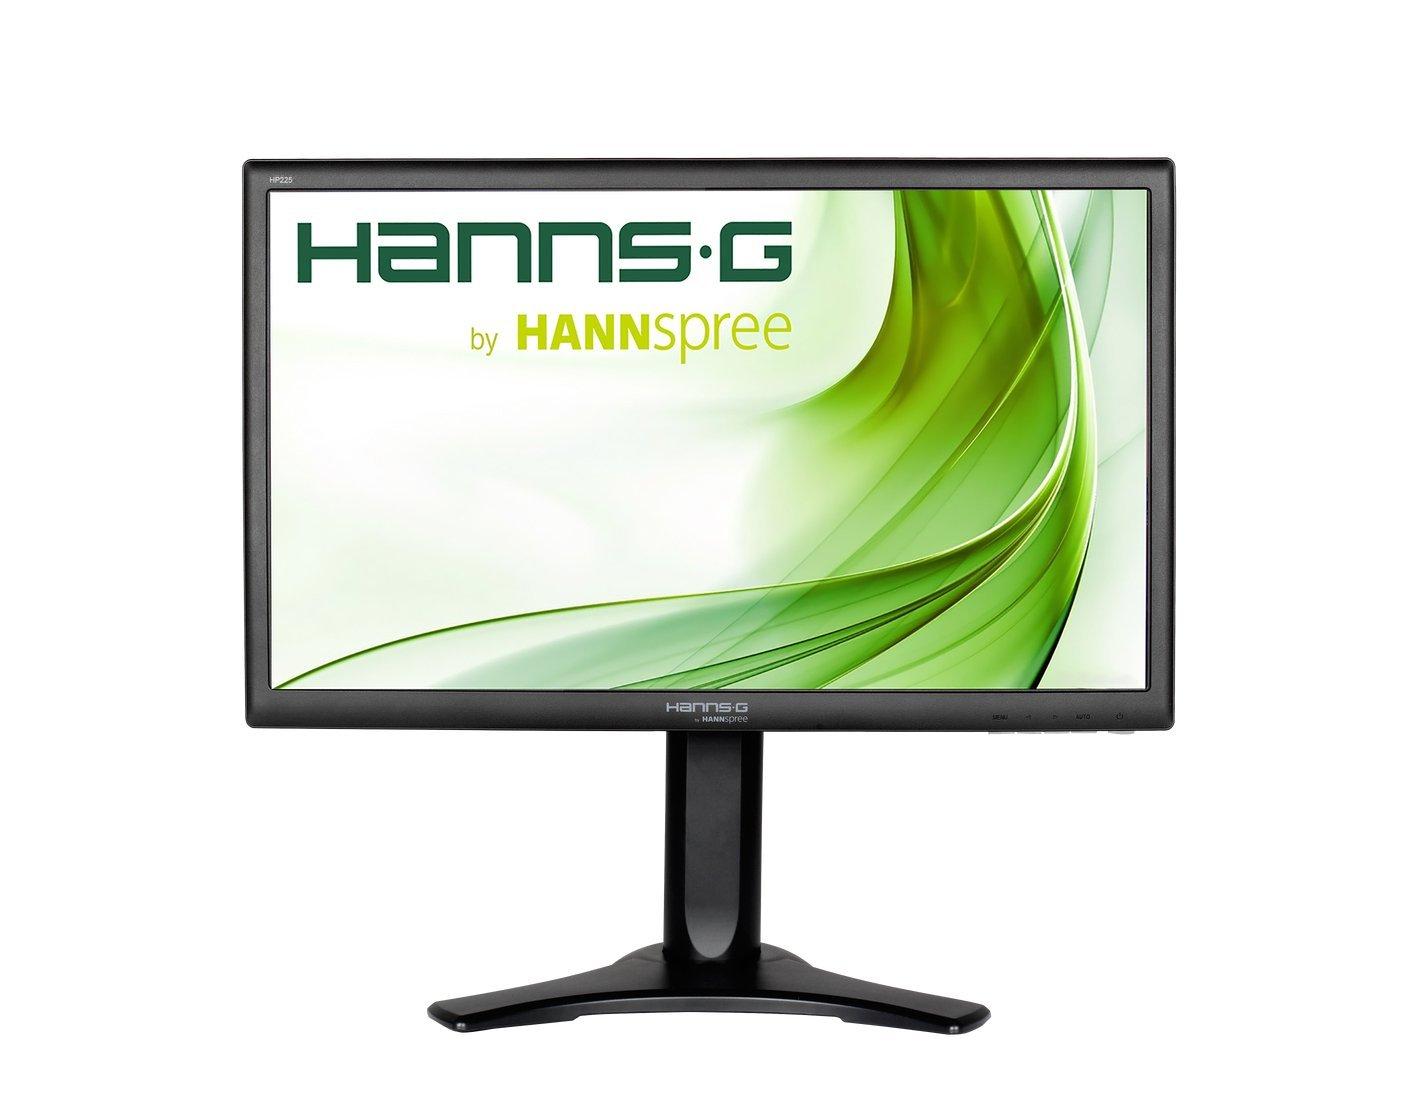 Hannspree Hanns.G HP 225 PJB 21.5' Full HD Negro Pantalla para PC - Monitor (54,6 cm (21.5'), 250 CD/m² , 1920 x 1080 Pixeles, 5 ms, LED, Full HD) Hannspree Hanns.G HP 225 PJB 21.5 Full HD Negro Pantalla para PC - Monitor (54 6 cm (21.5) 250 CD/m²